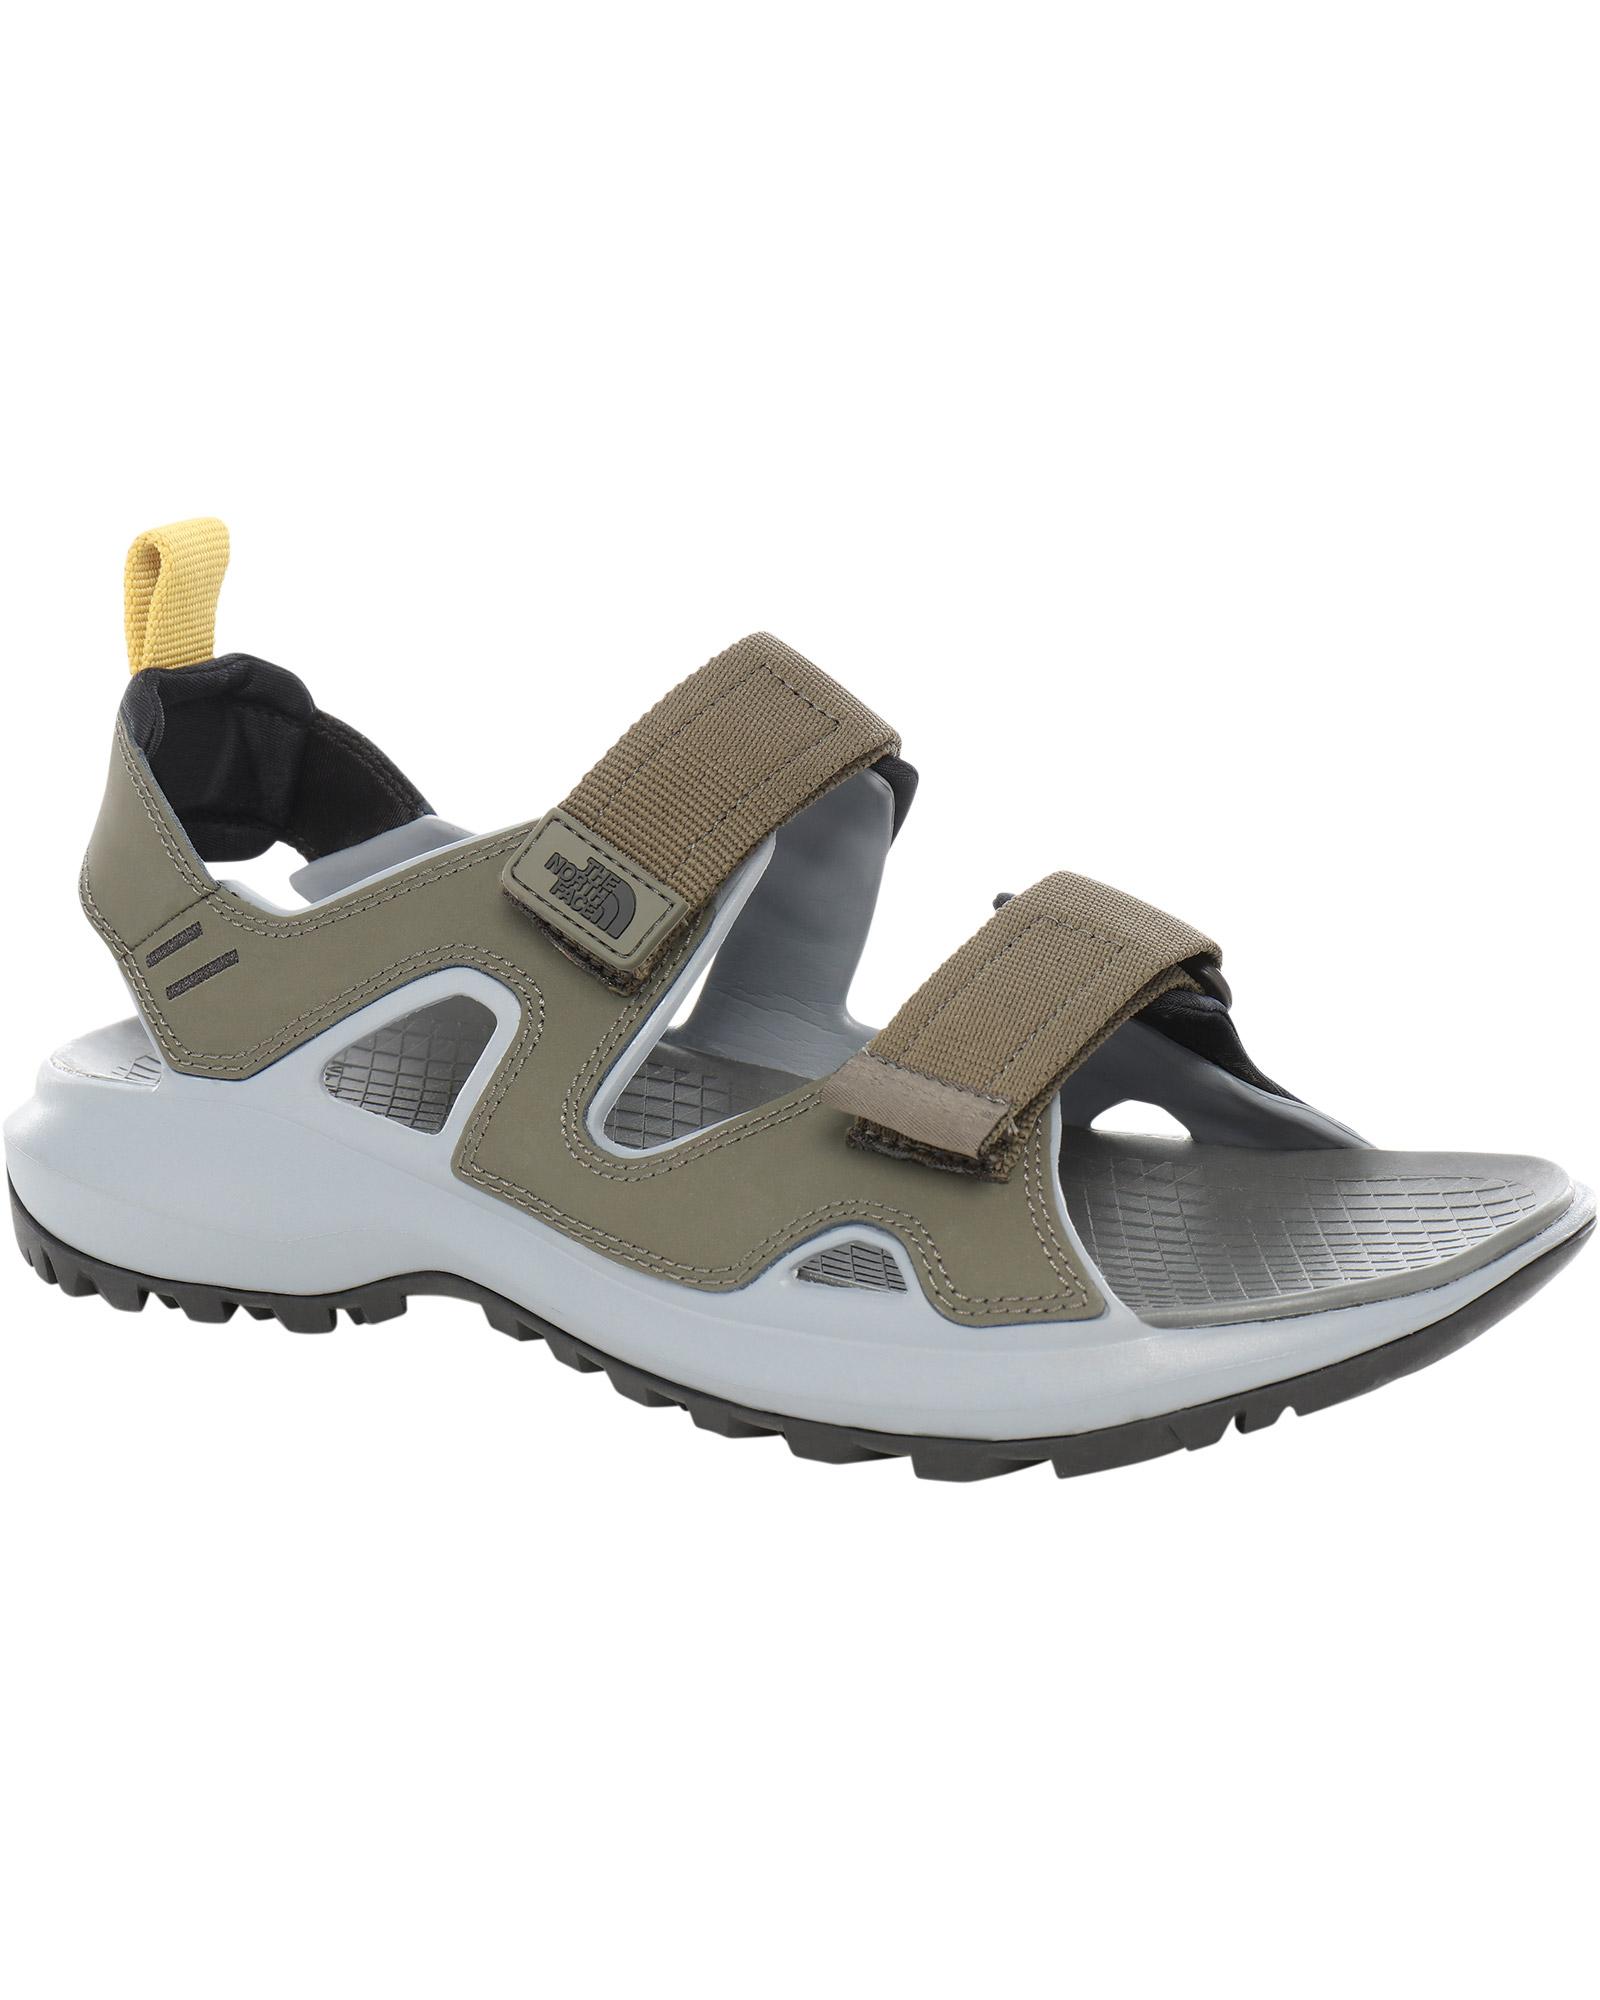 The North Face Men's Hedgehog III Sandals 0